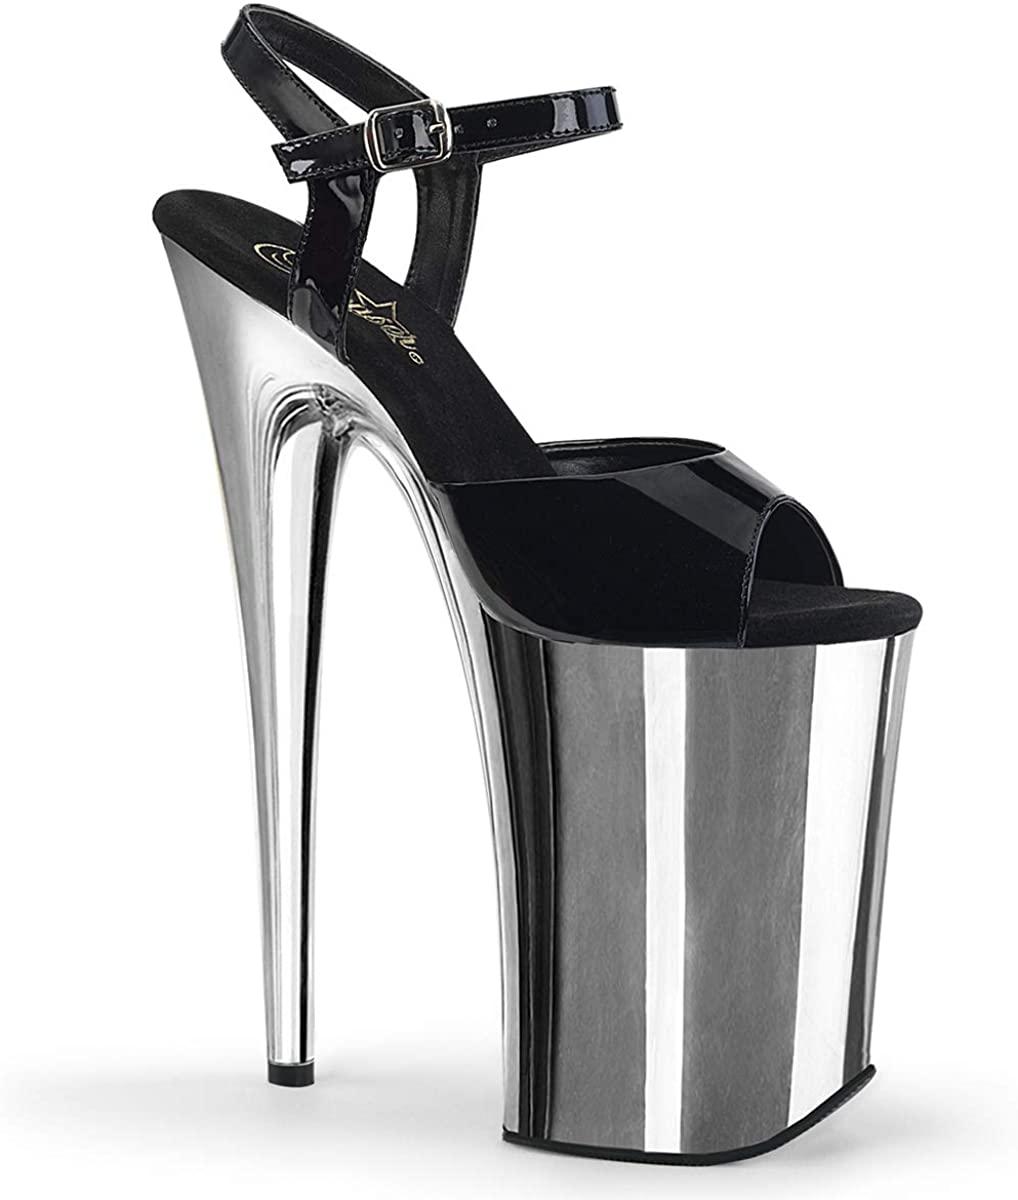 Pleaser Women's Infinity-909 Ankle-Strap Sandal